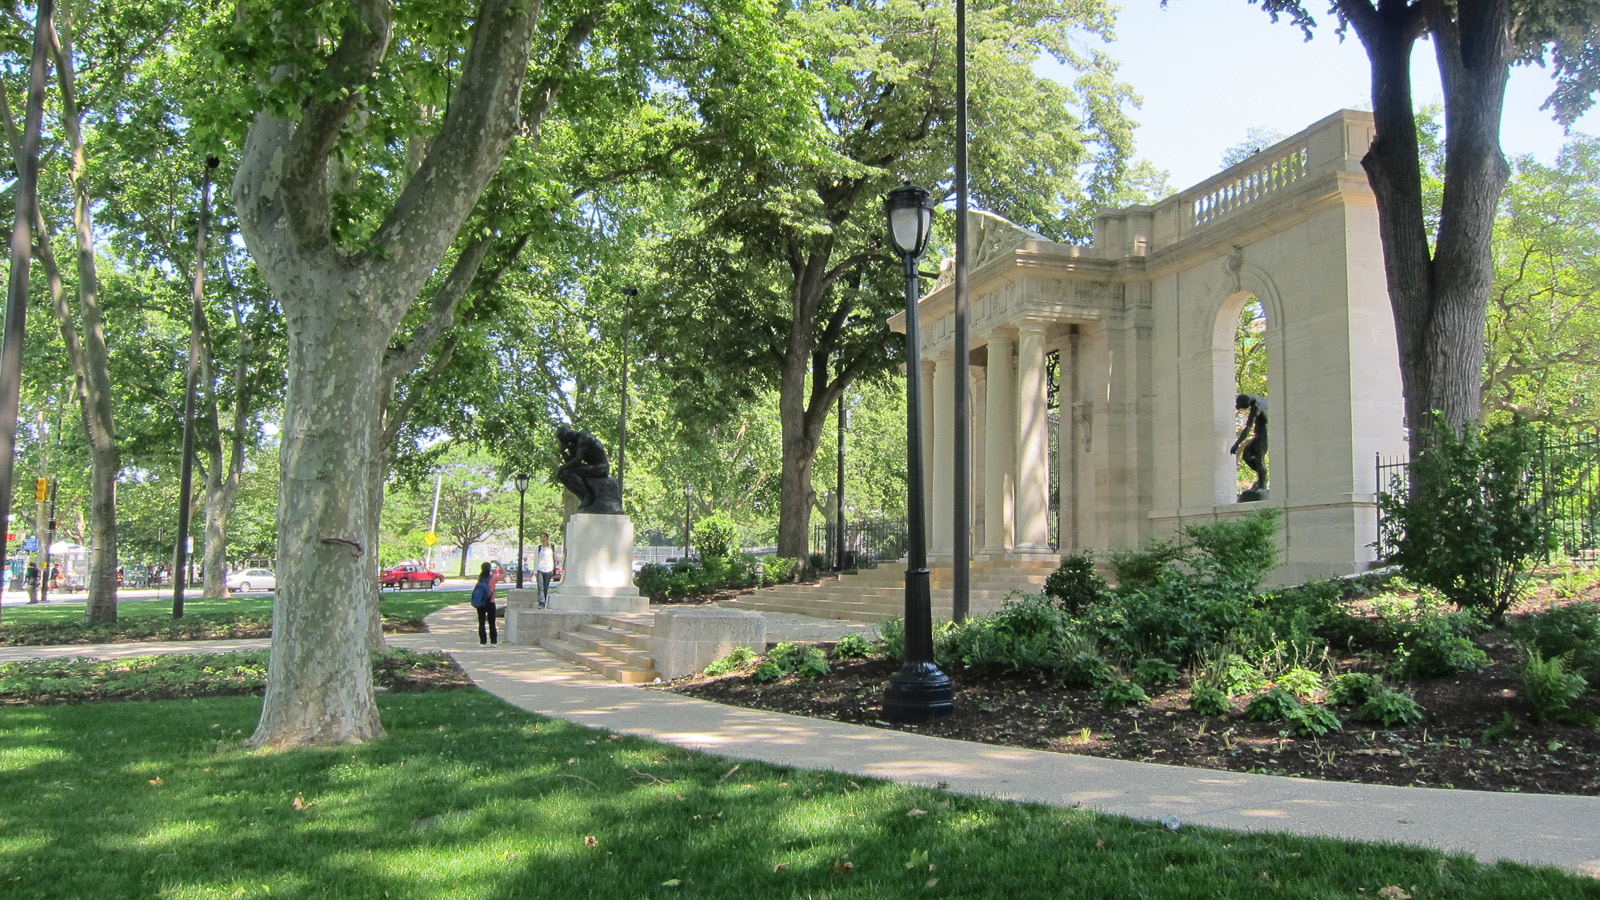 PA_Philadelphia_RodinMuseum_signature_CharlesBirnbaum_2012_01.jpg